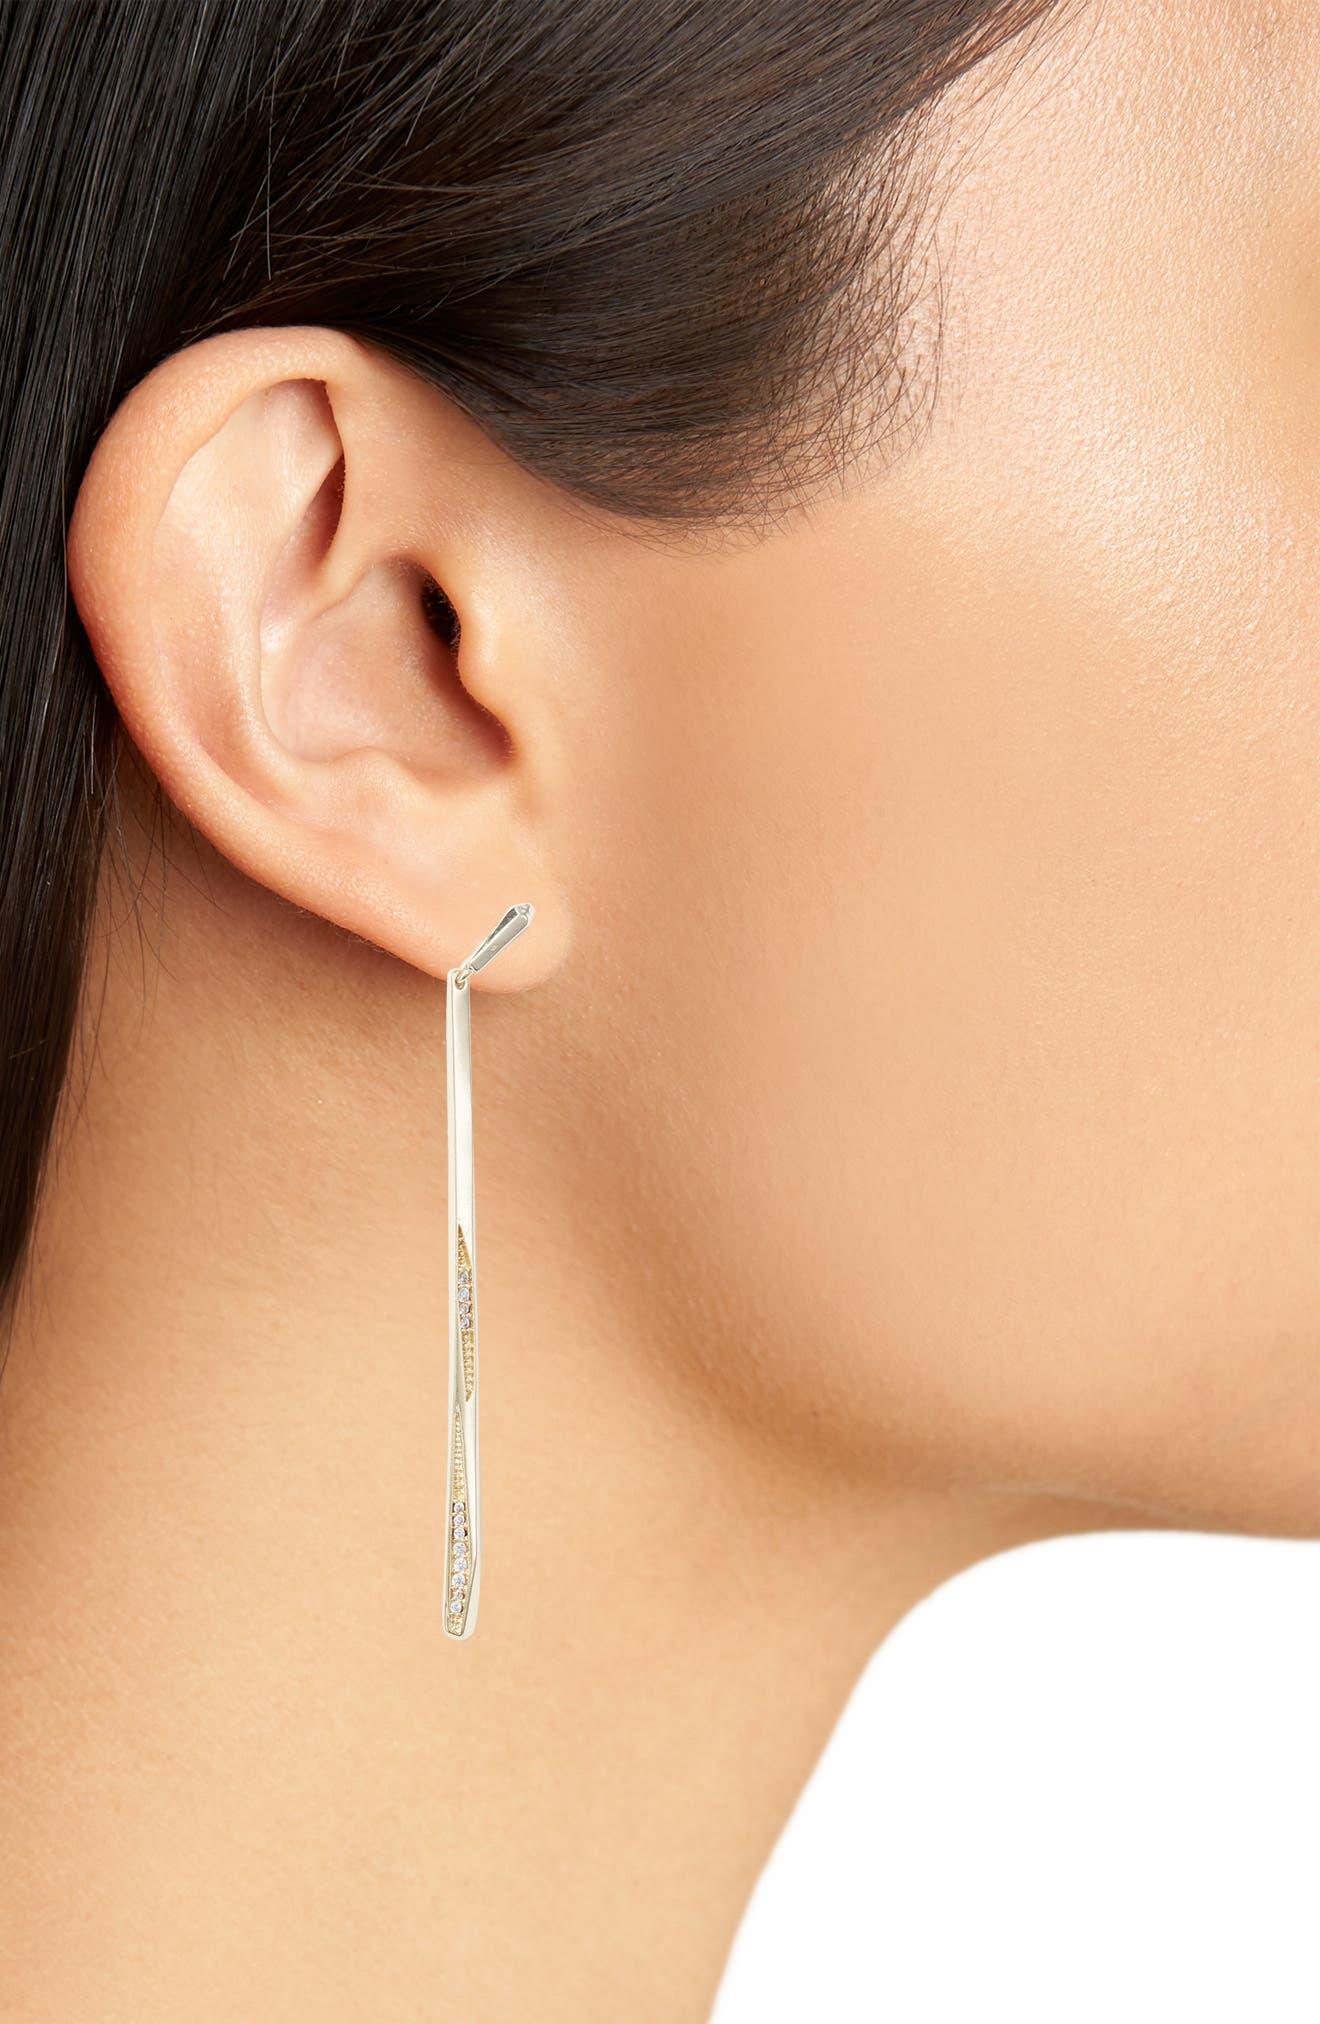 Melissa Drop Earrings,                             Alternate thumbnail 2, color,                             White Cz/ Gold